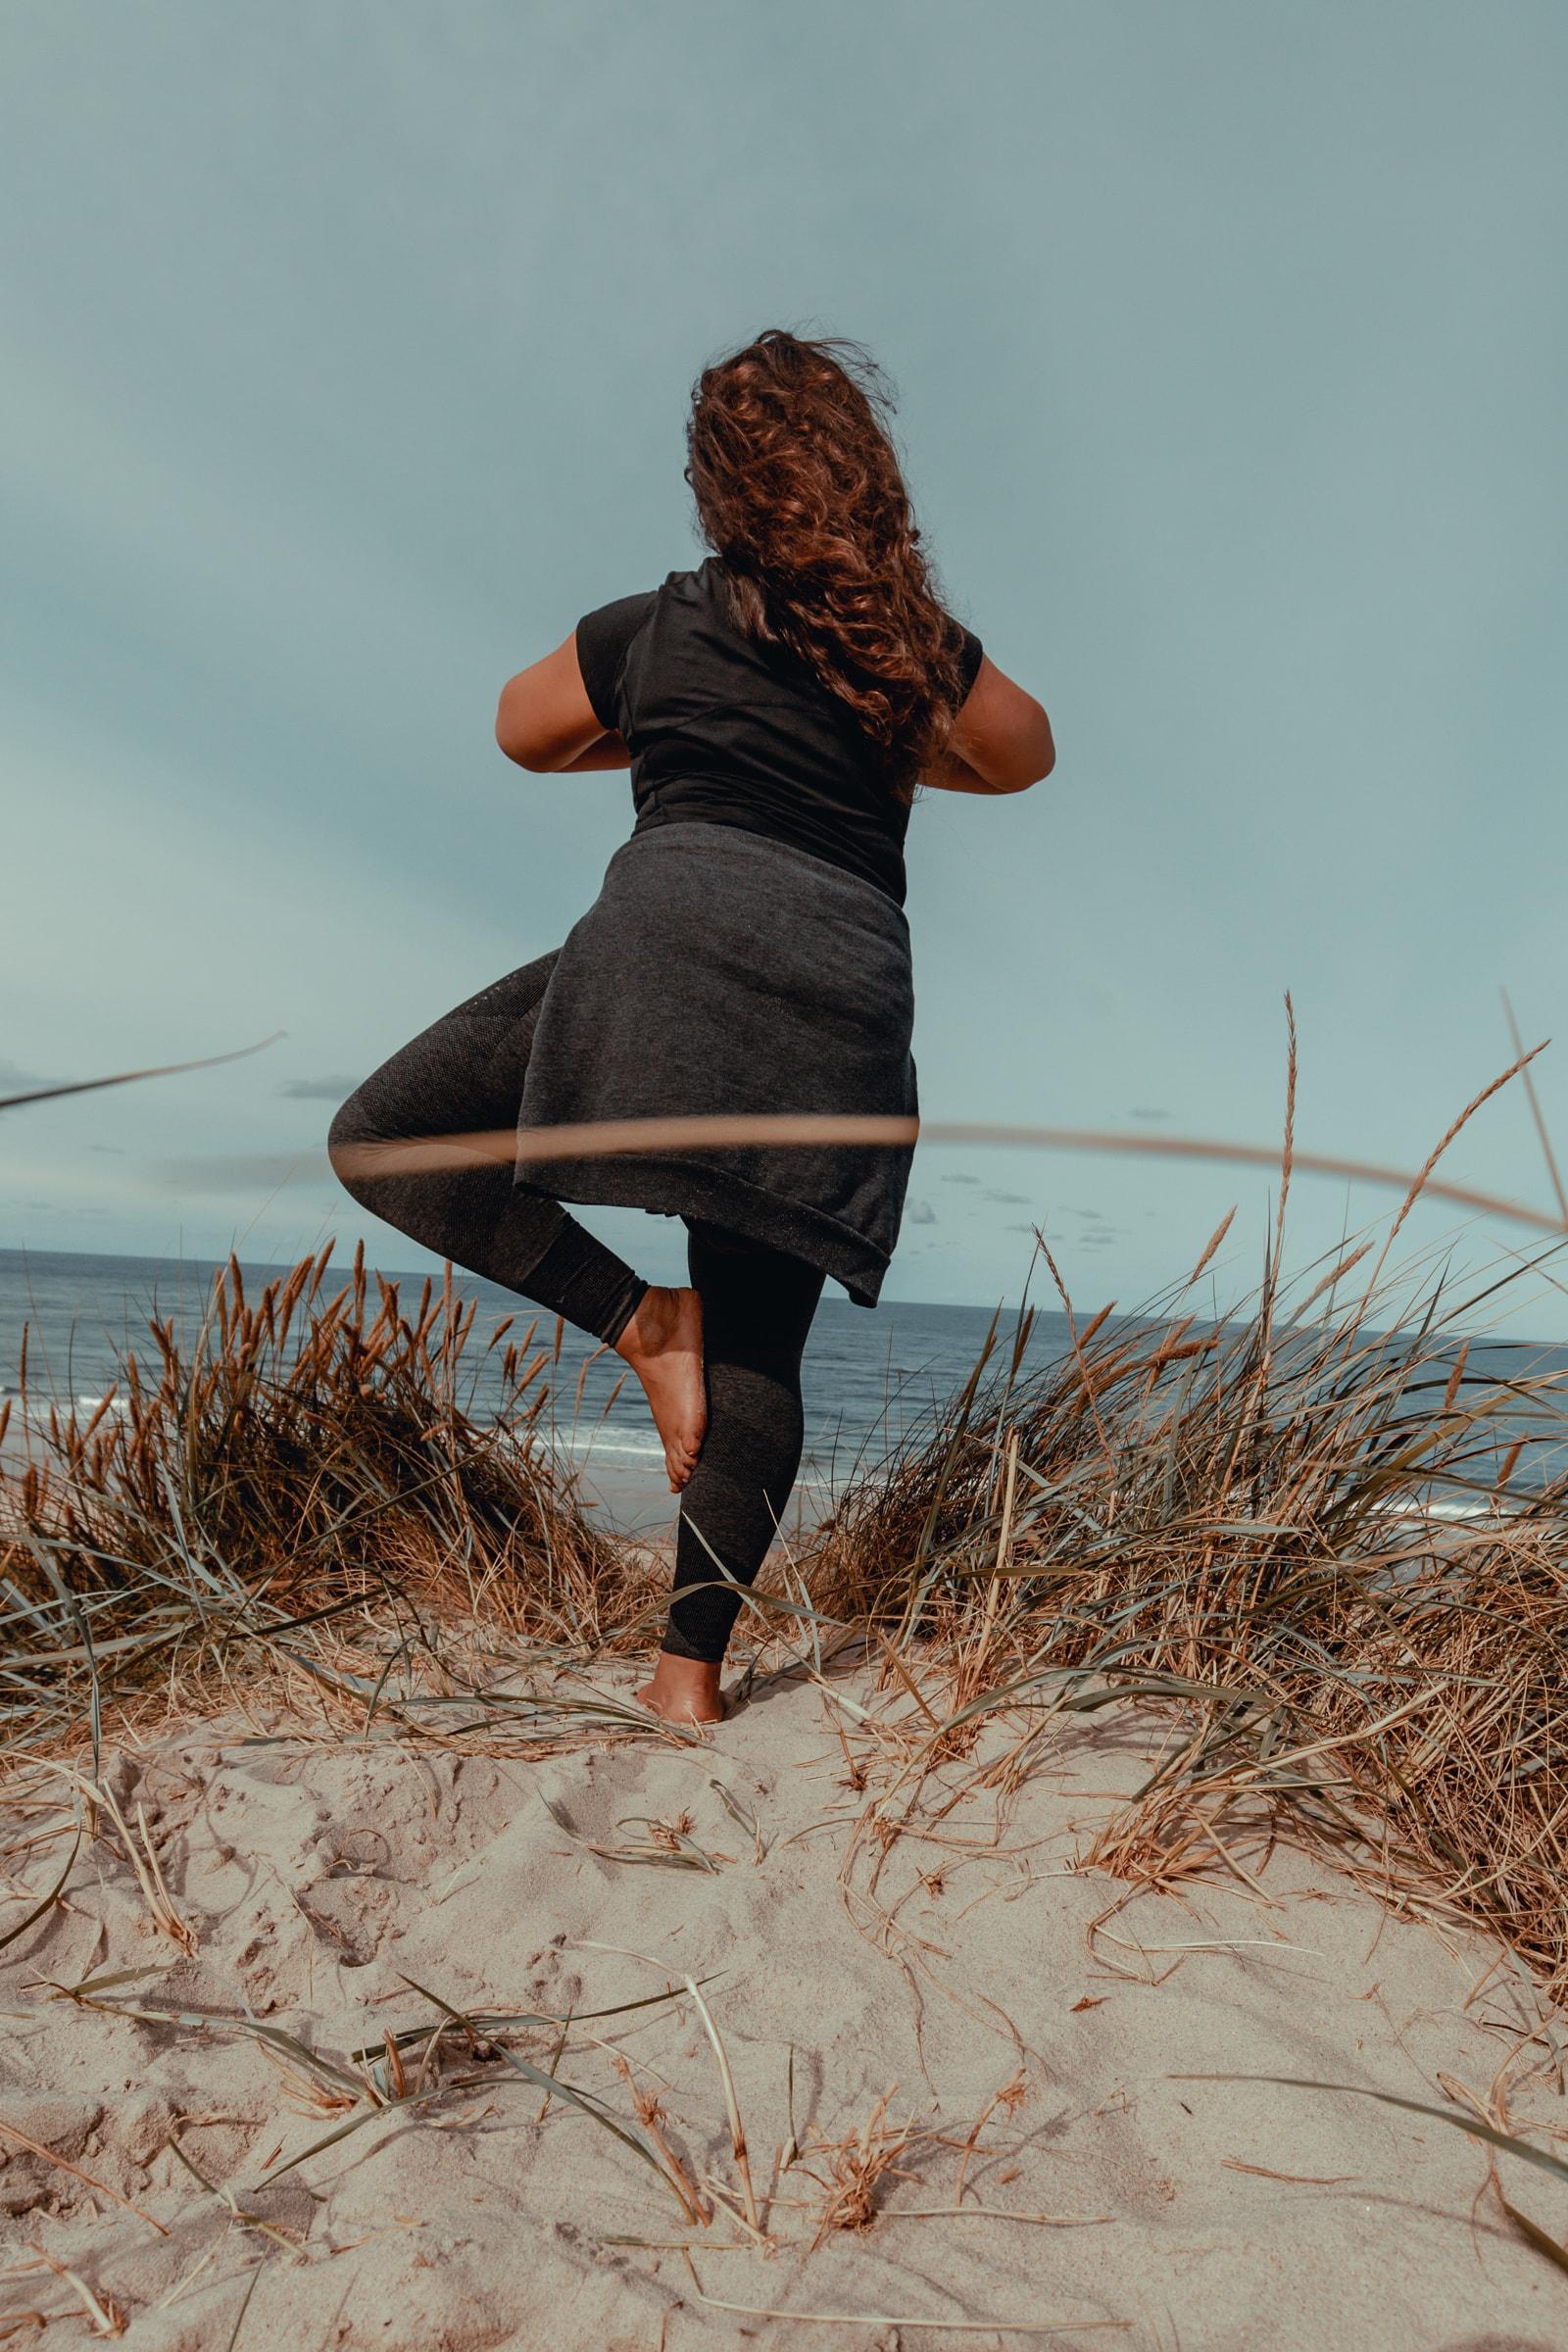 Sylt: Bildungsurlaub mit Yoga, Strand & Meer 7